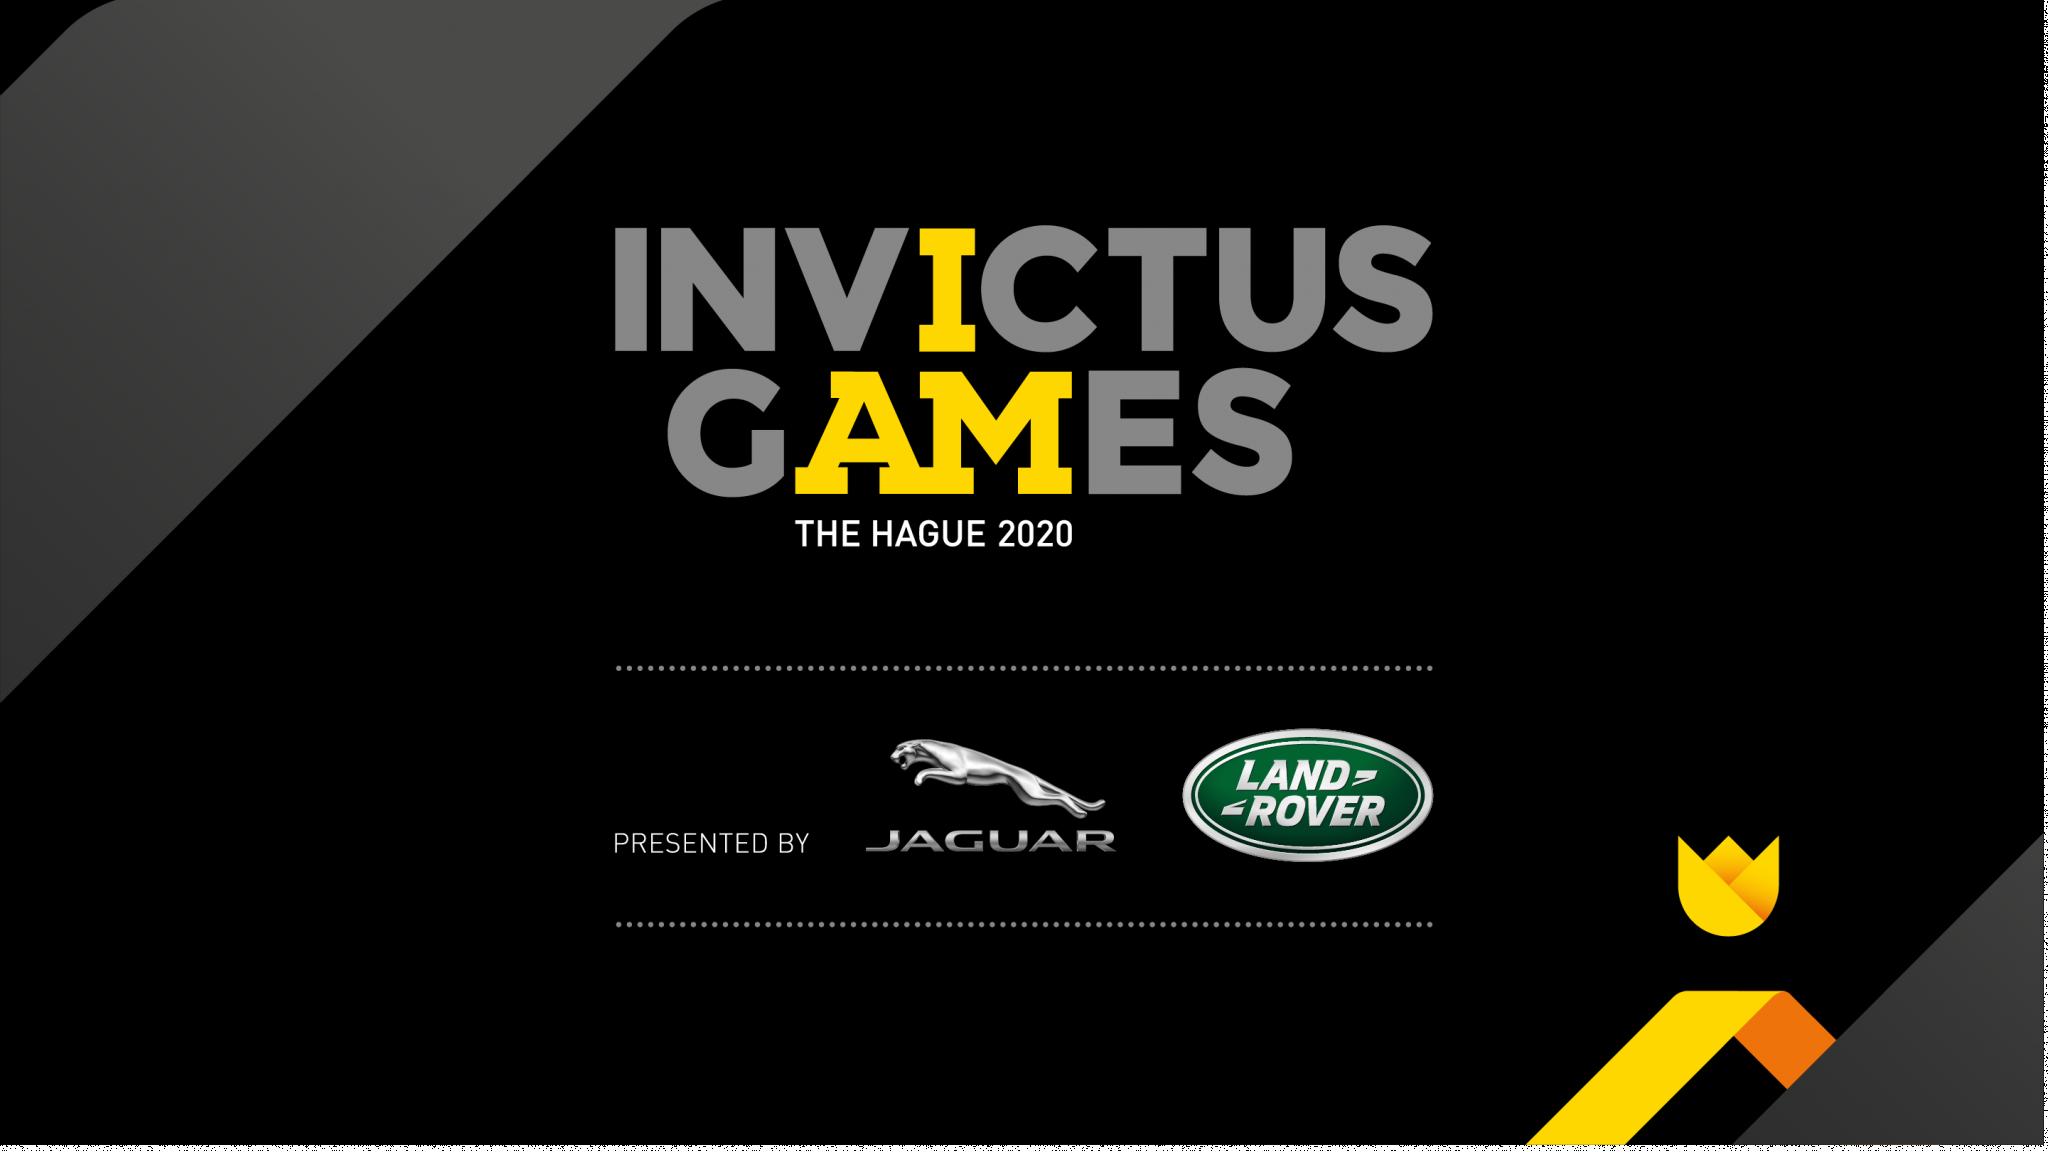 The coronavirus pandemic has postponed the 2020 Invictus Games ©Invictus Games Foundation